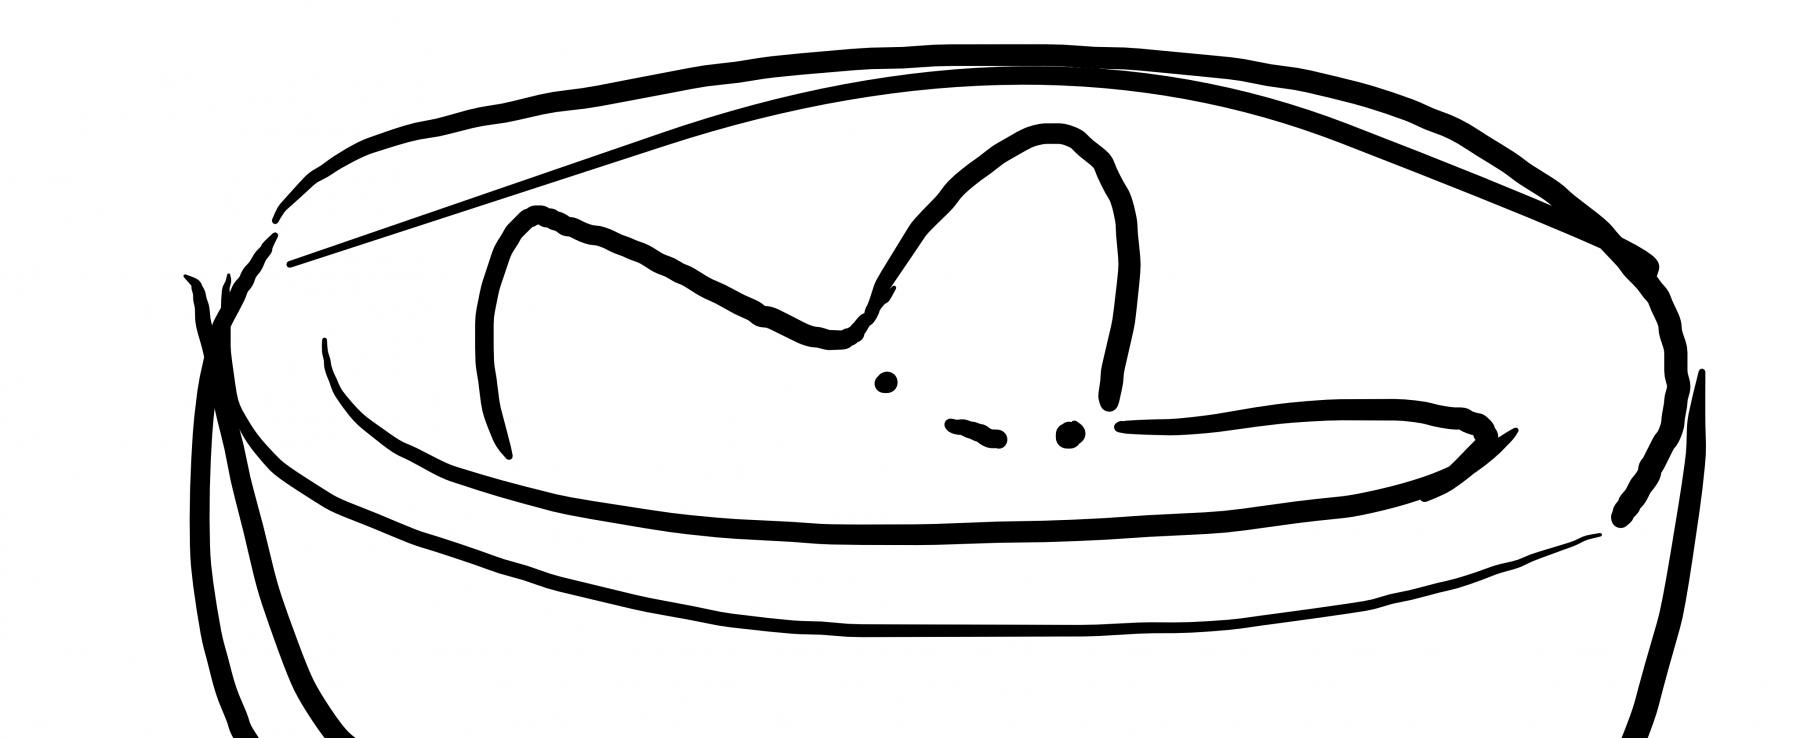 Nut-Thumbnail-Rough-Board00315